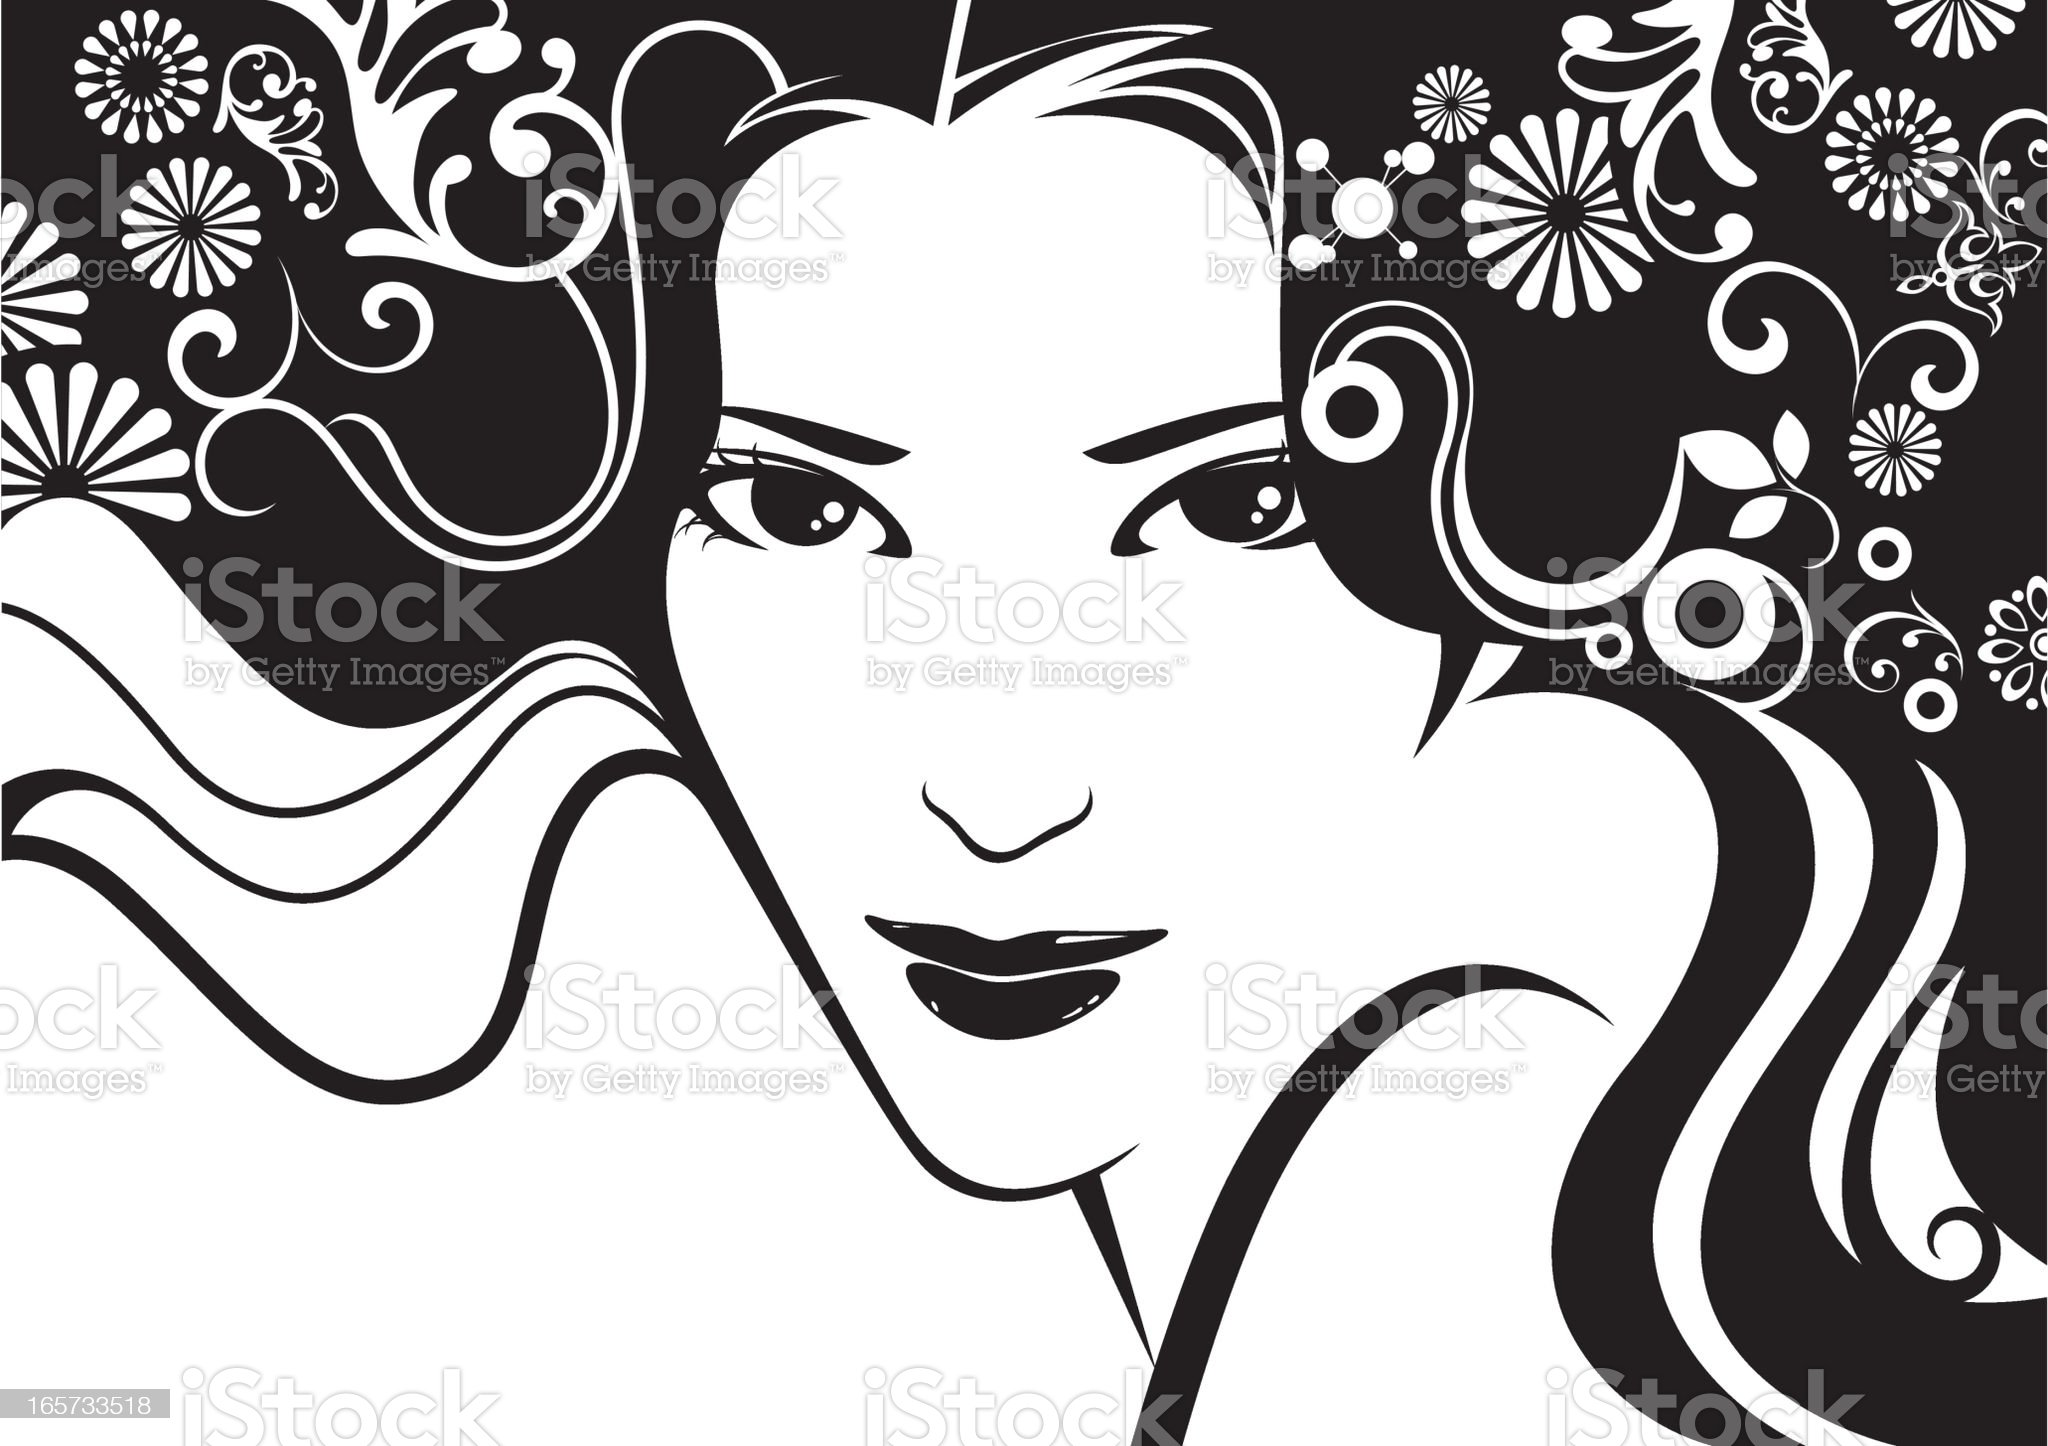 Simply beauty. royalty-free stock vector art